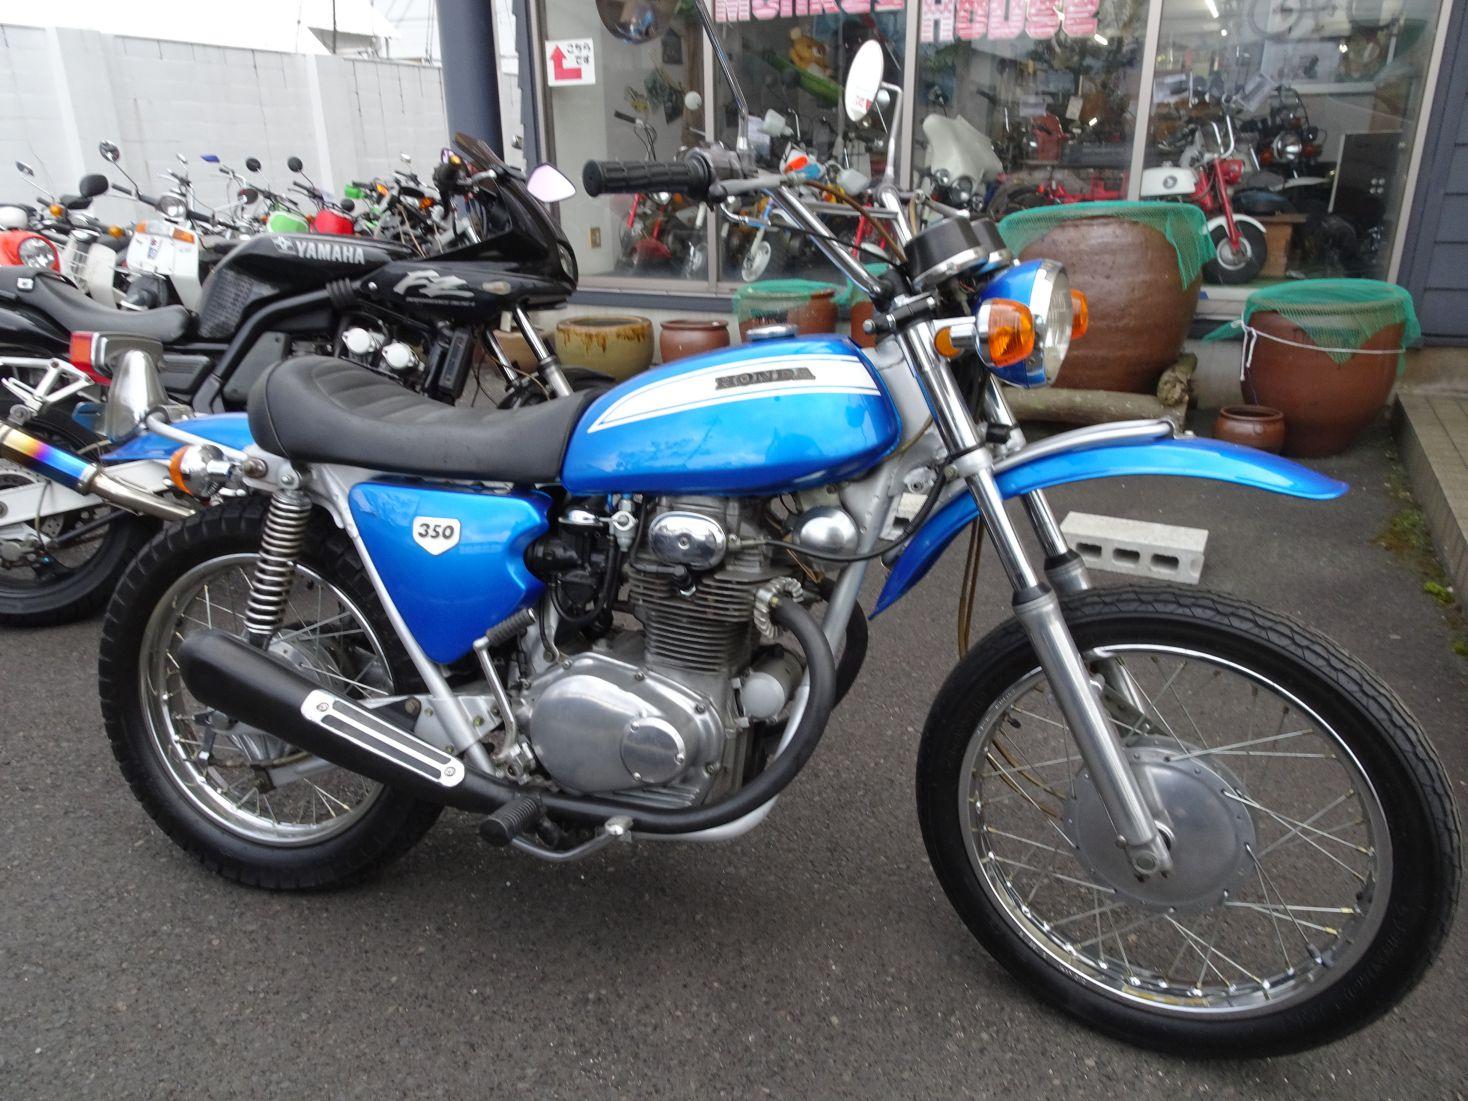 SL350